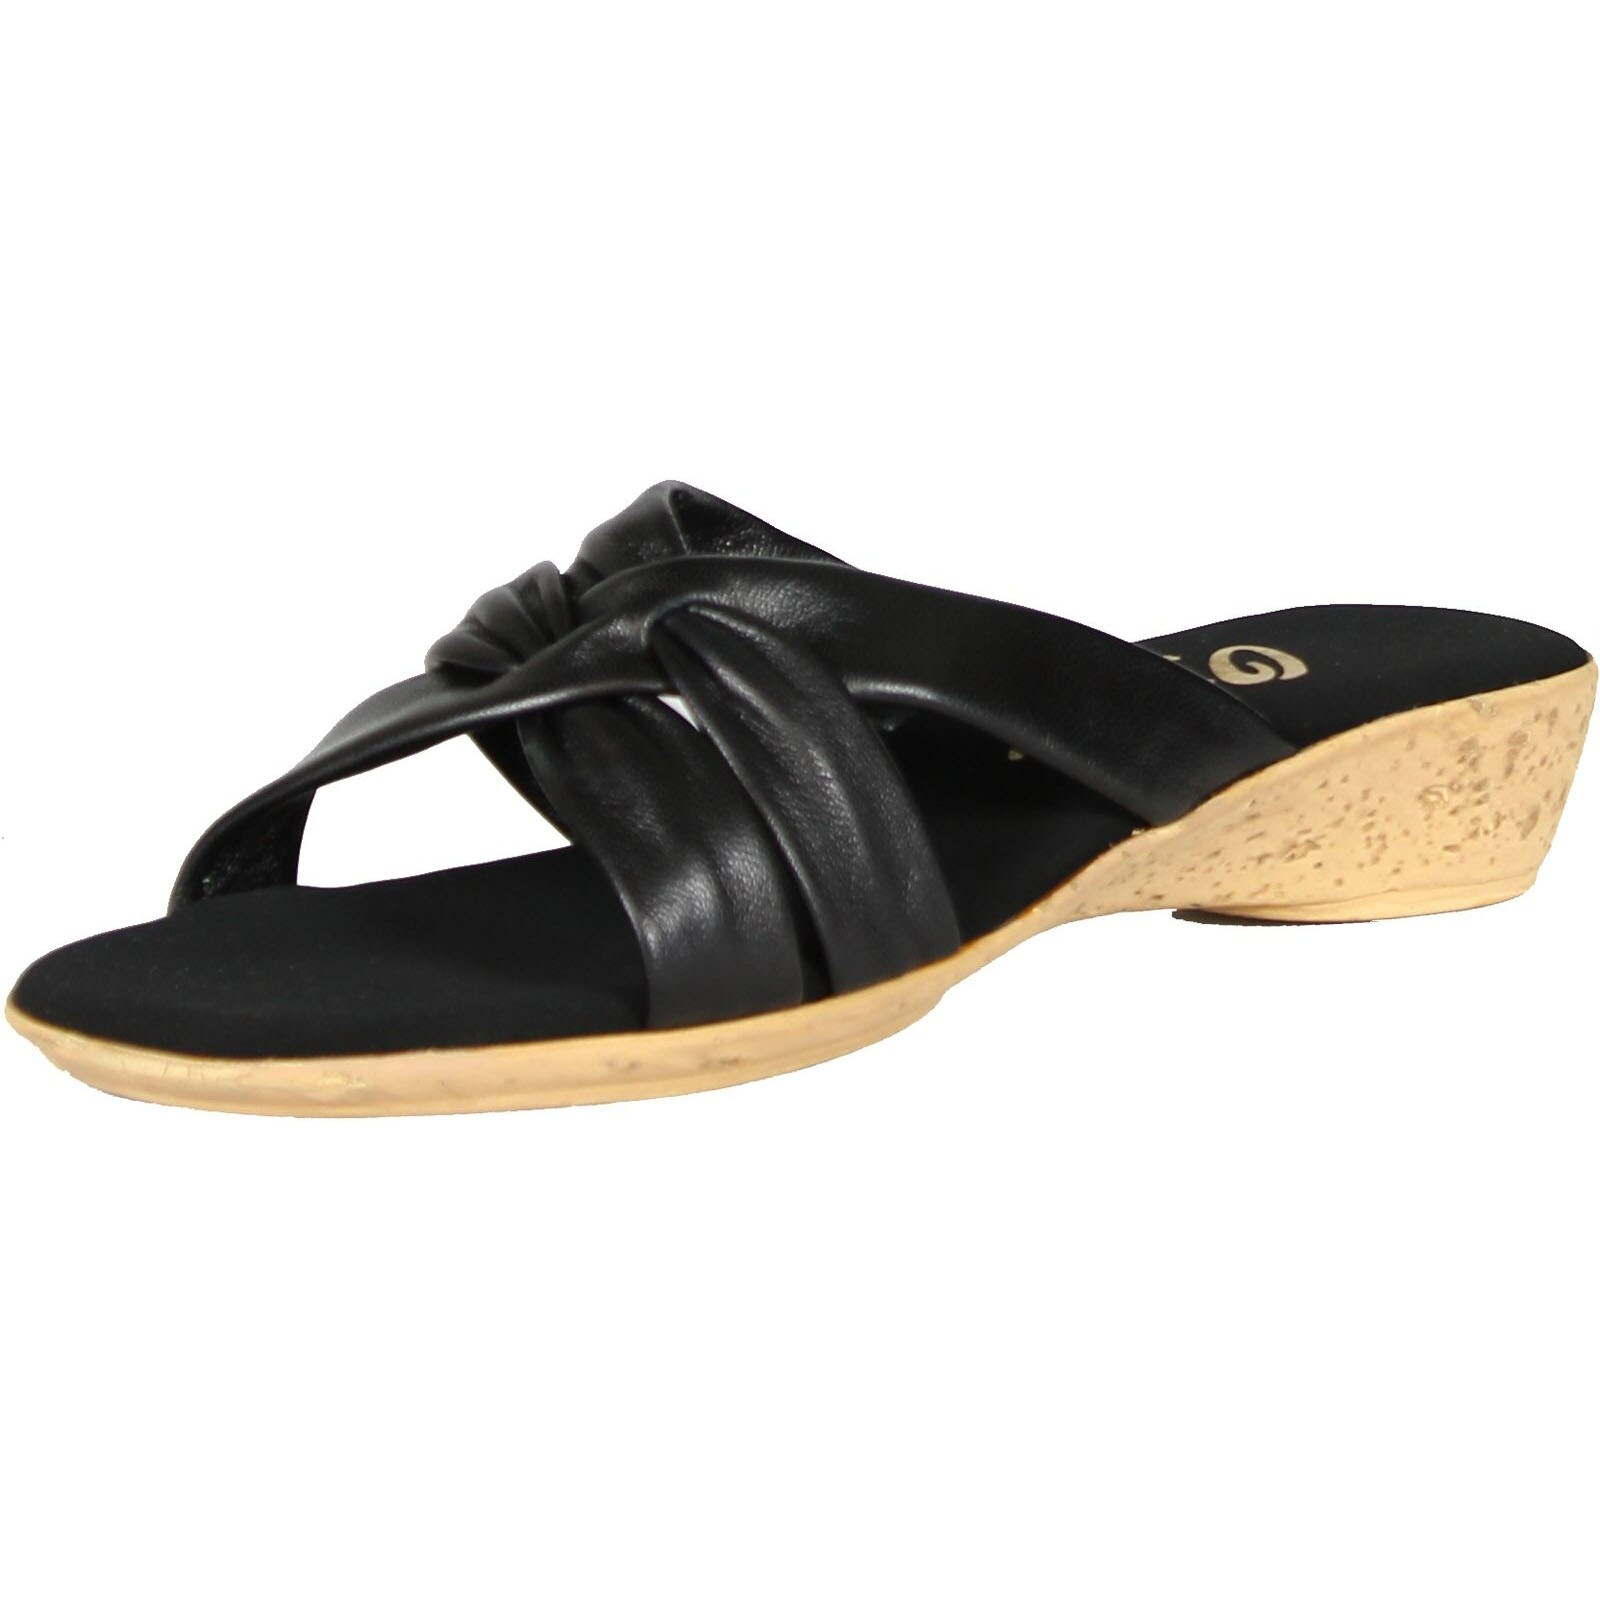 a58cf2cbd692 Shop Onex Women s Sail Sandal - Free Shipping Today - Overstock - 14312424